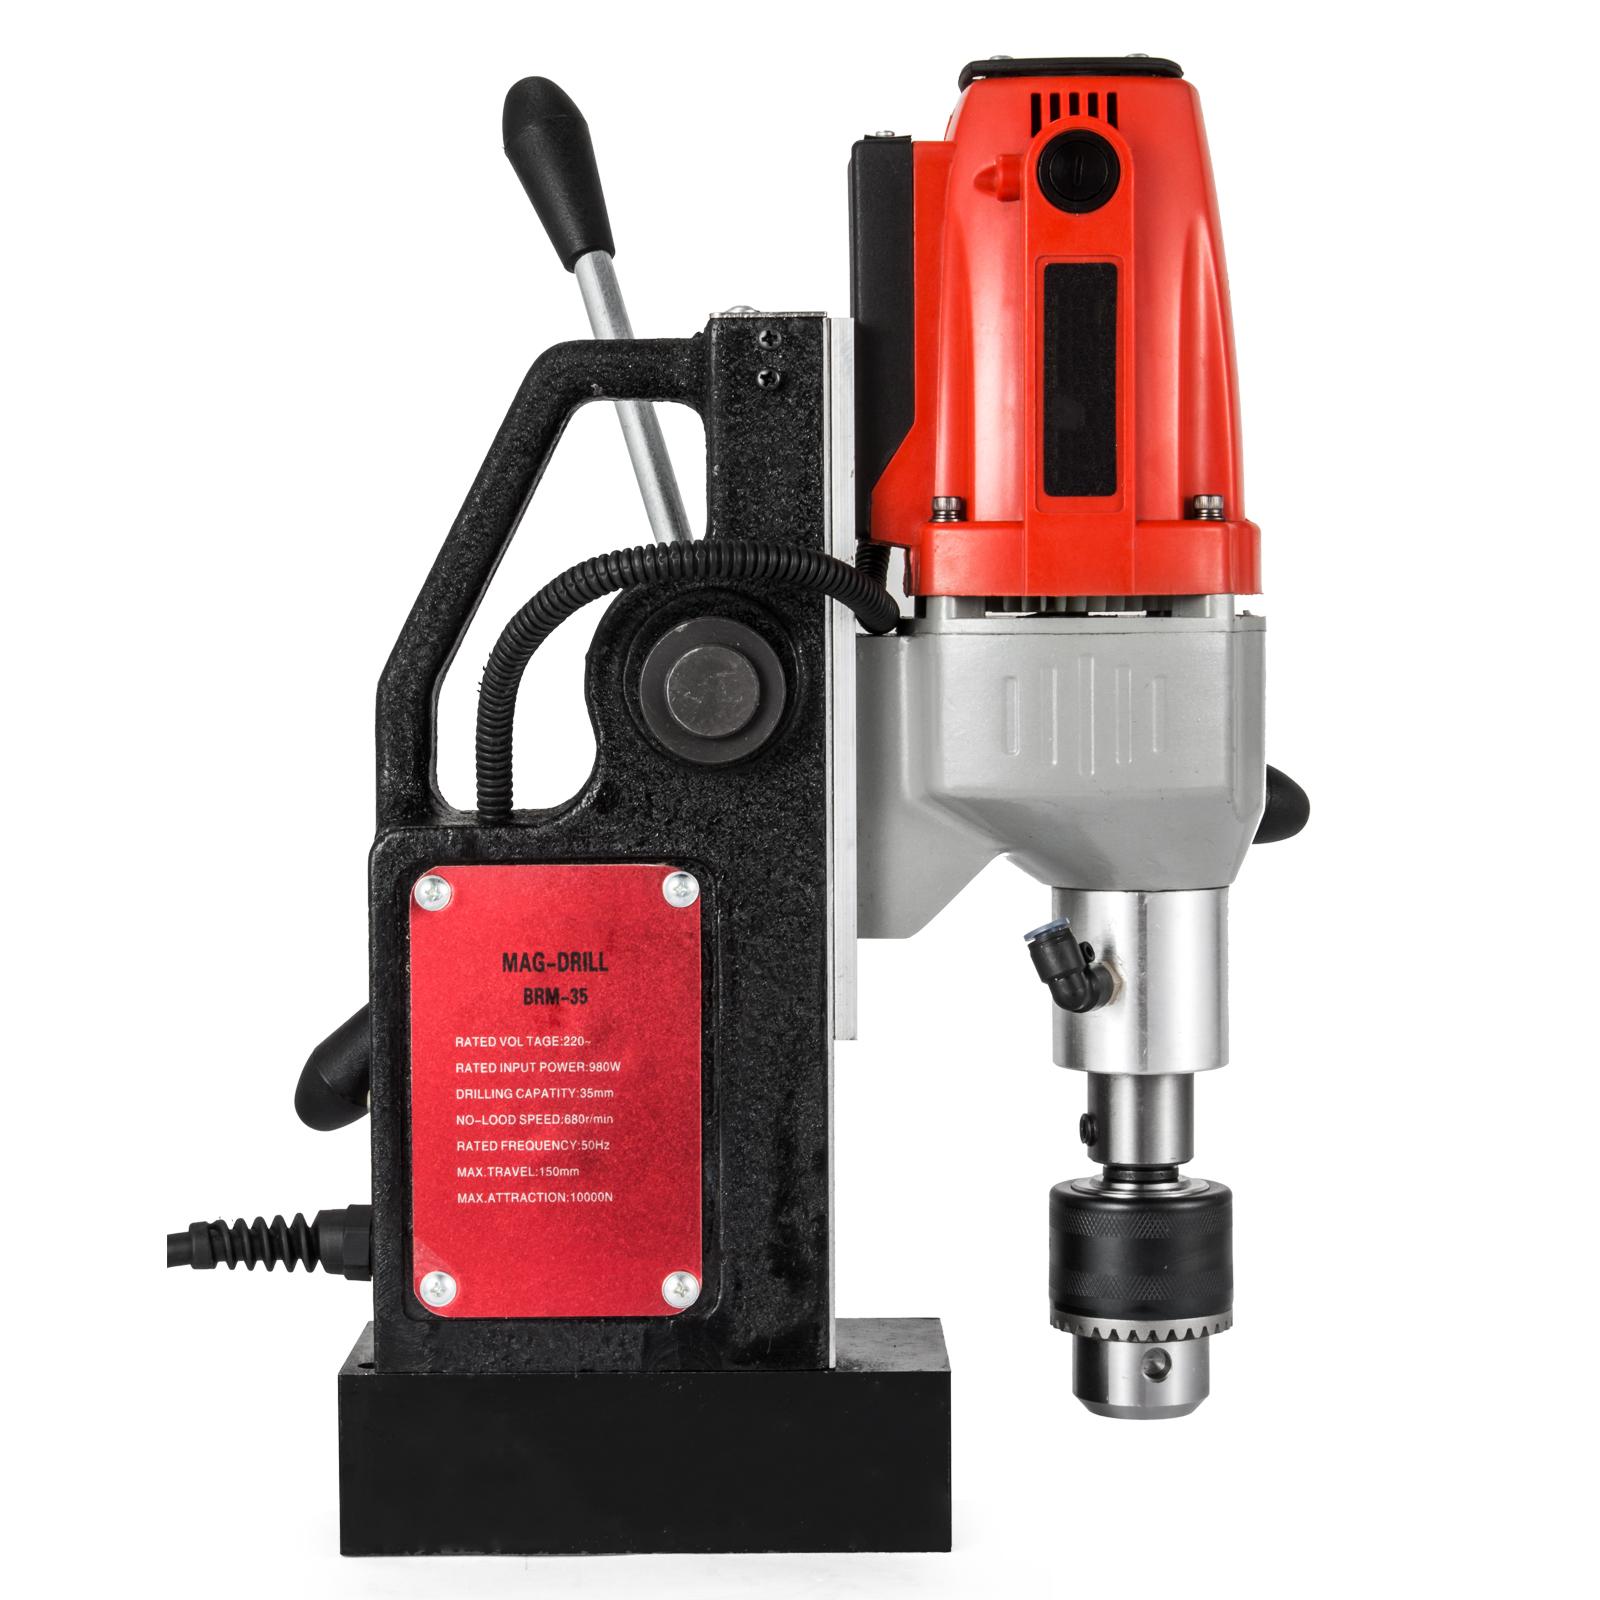 MB23-BRM35-MD40-Trapano-Perforatrice-Carotatore-Fresa-Magnetico-12-40mm-230V miniatura 69